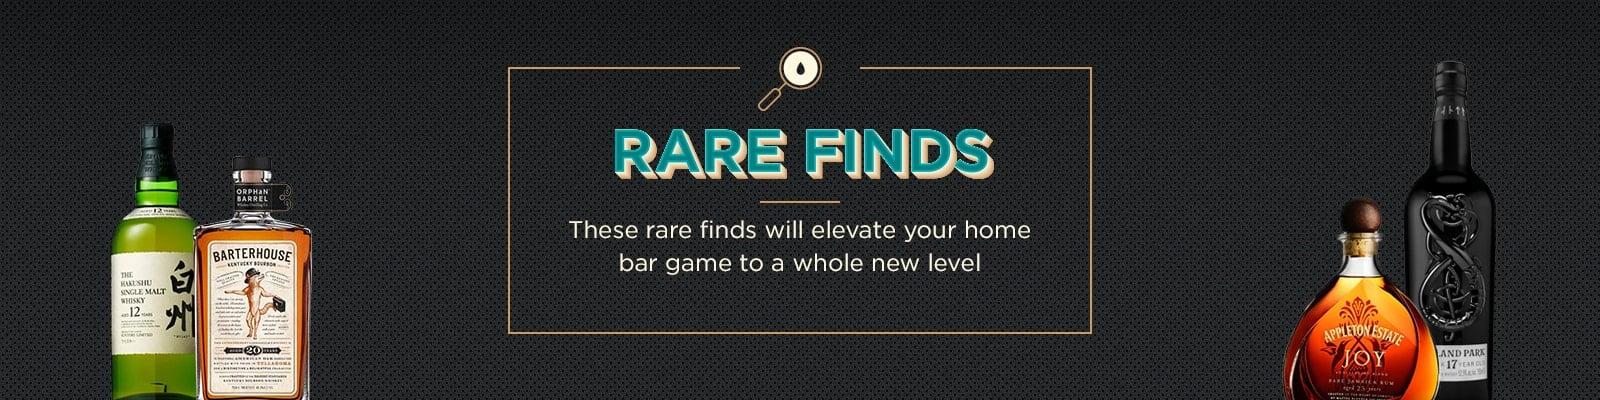 Rare Finds